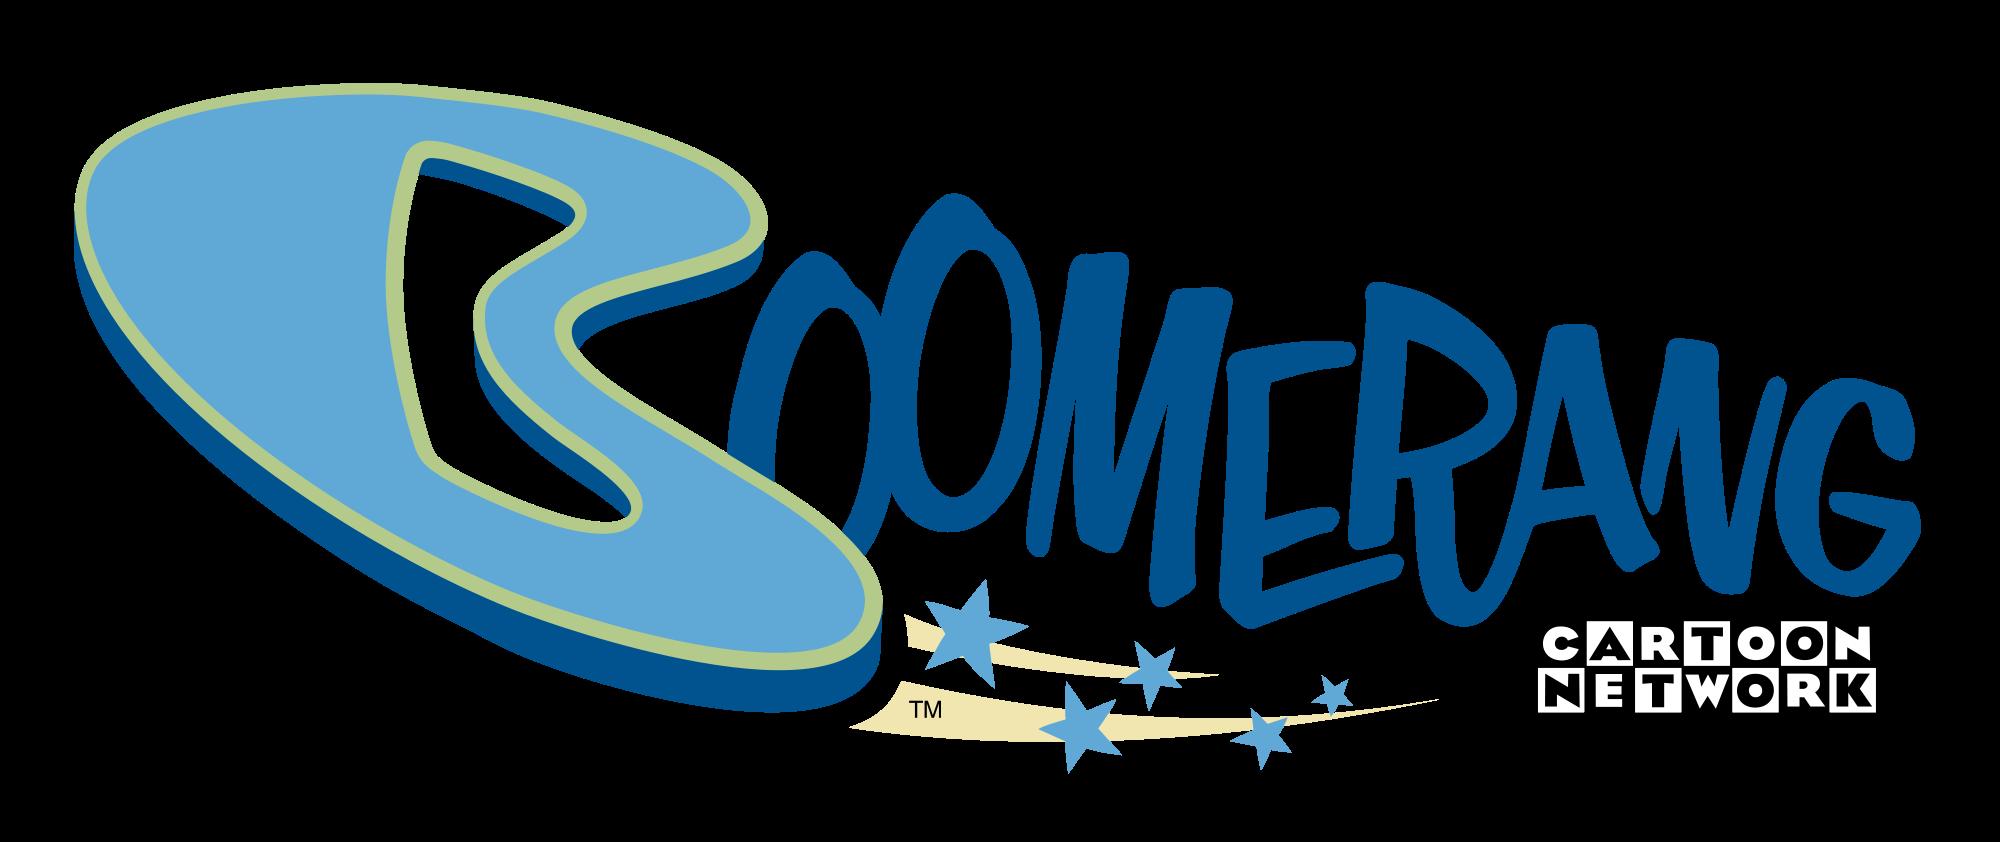 cartoon network nostalgia saturday morning cartoons and 90s kids rh pinterest com fire island logo tv wiki sony tv logo wiki